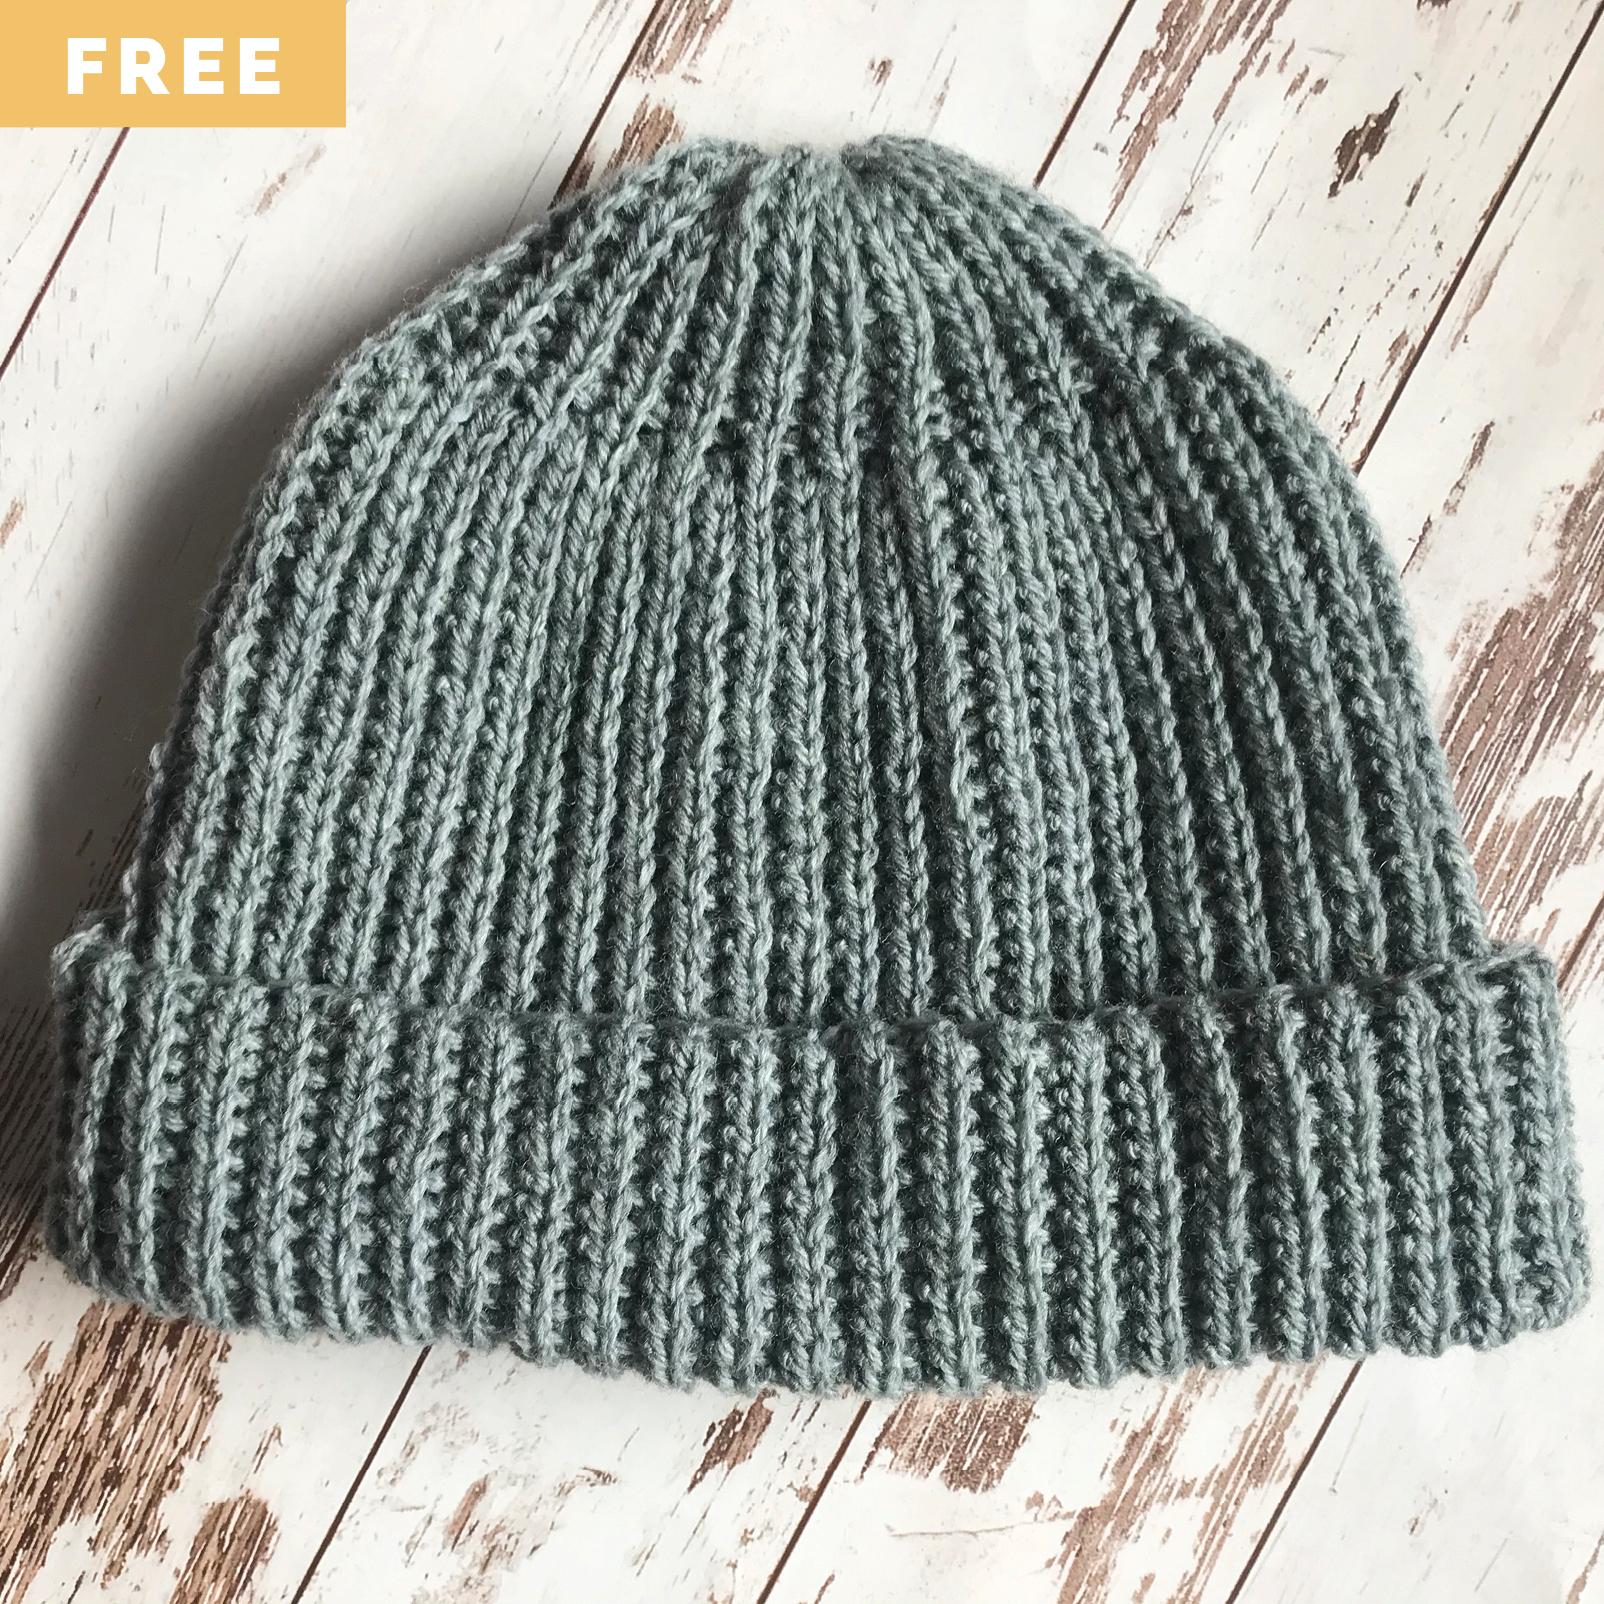 Free Crochet Pattern - Ribbed Watch Cap